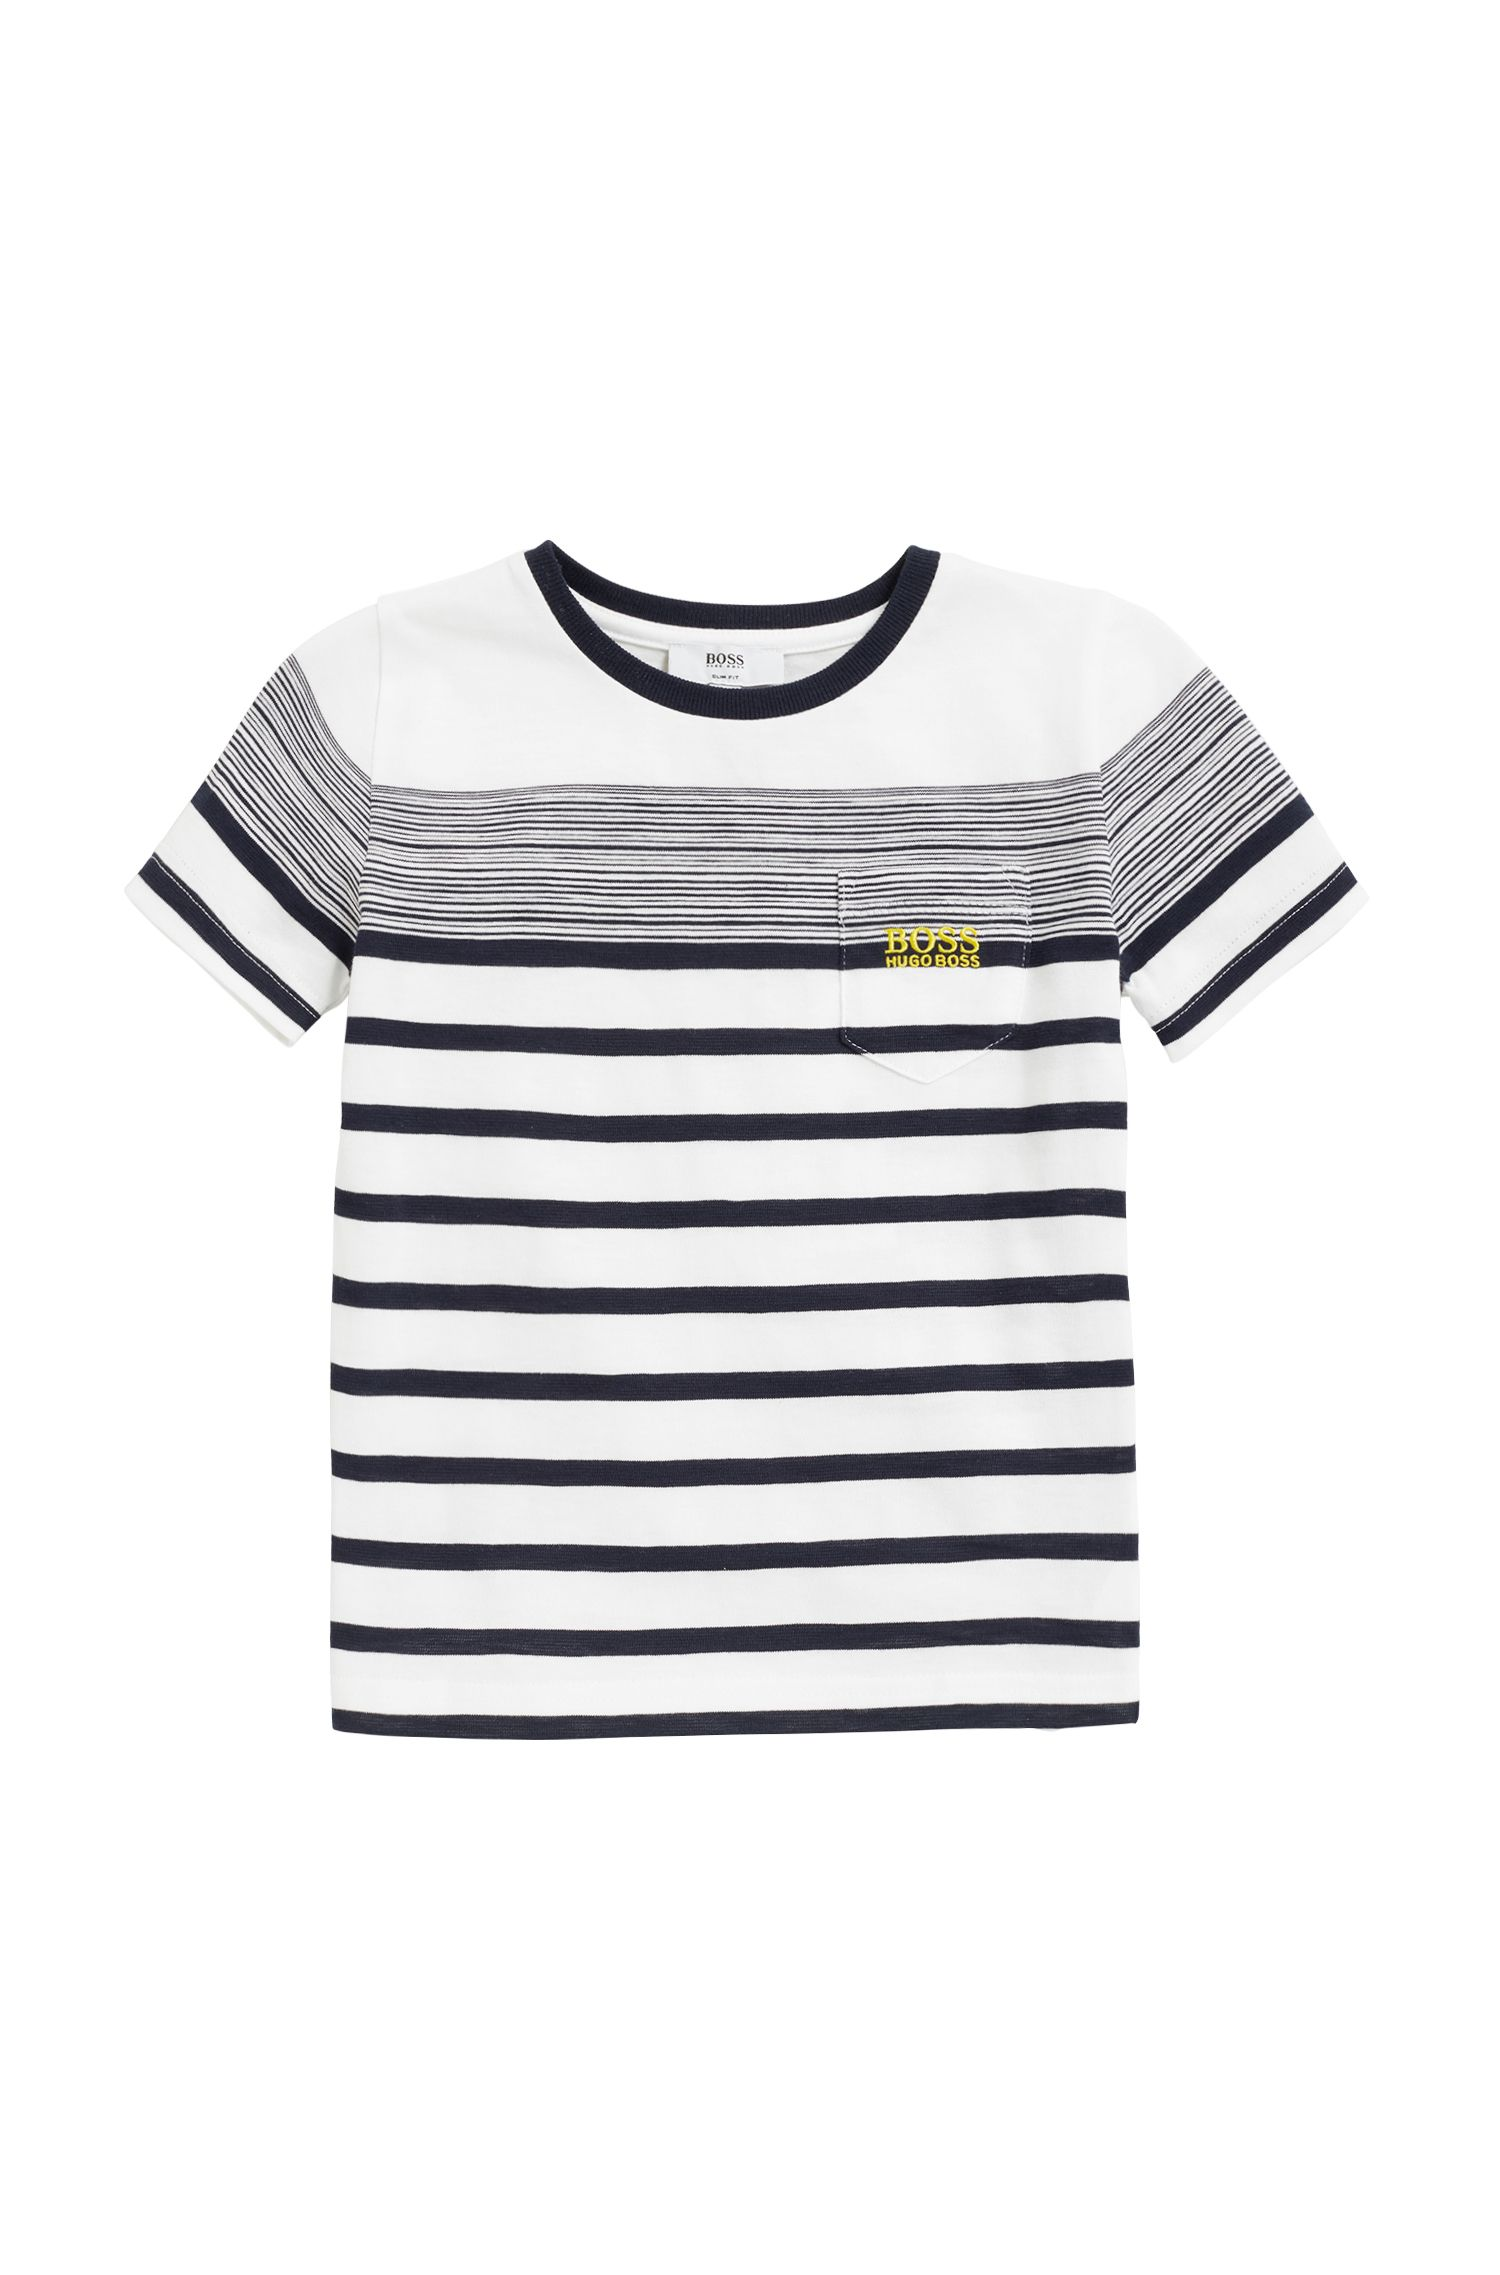 Bretons gestreept kinder-T-shirt van slub-katoenjersey